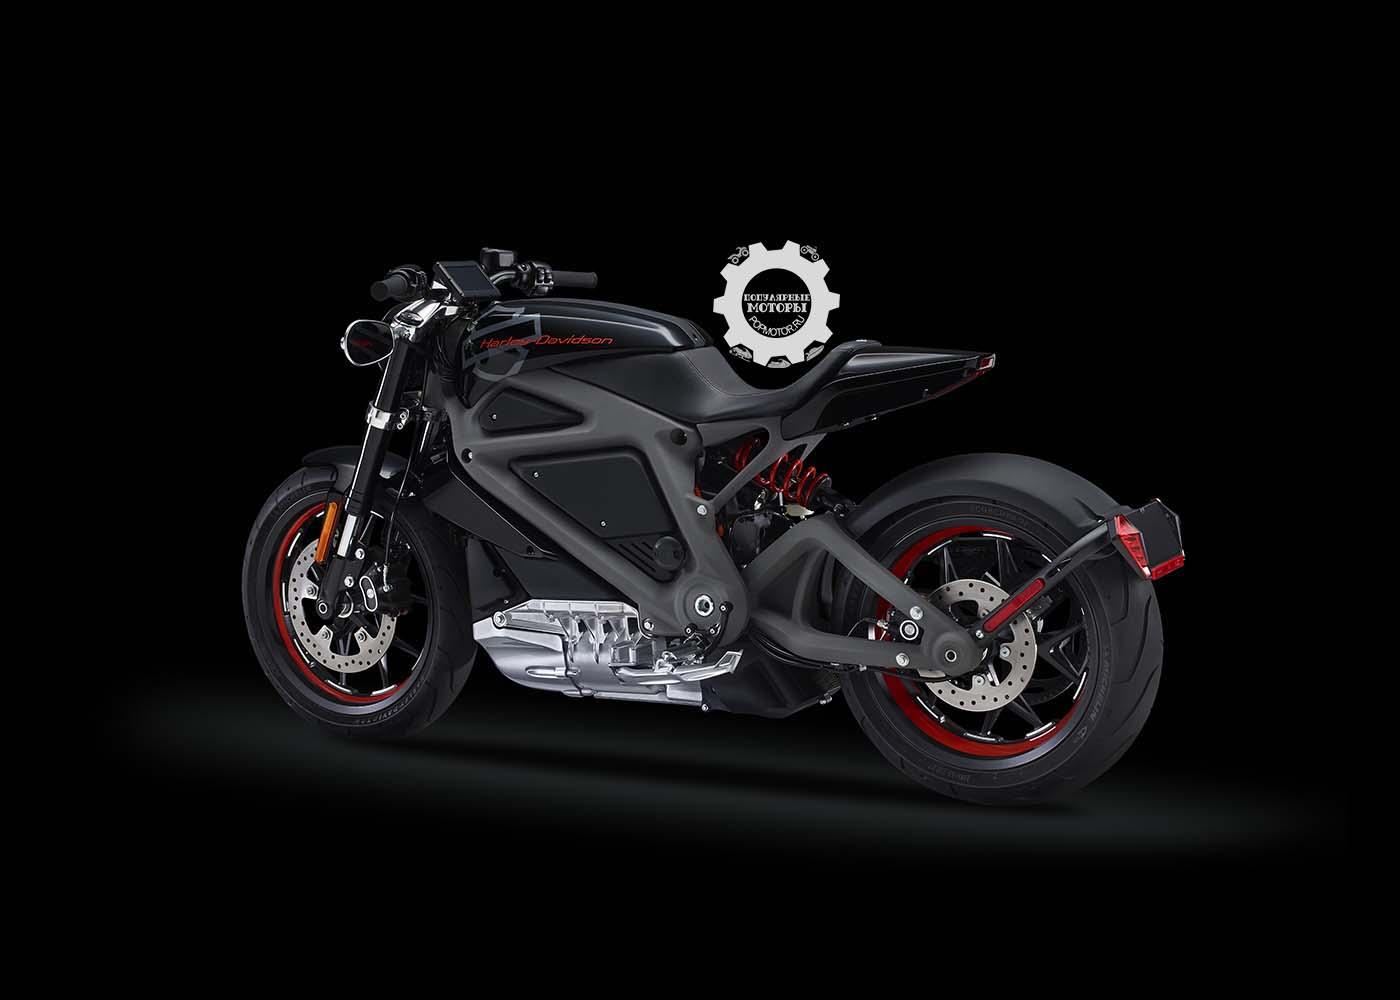 Анонс электрического мотоцикла Harley-Davidson